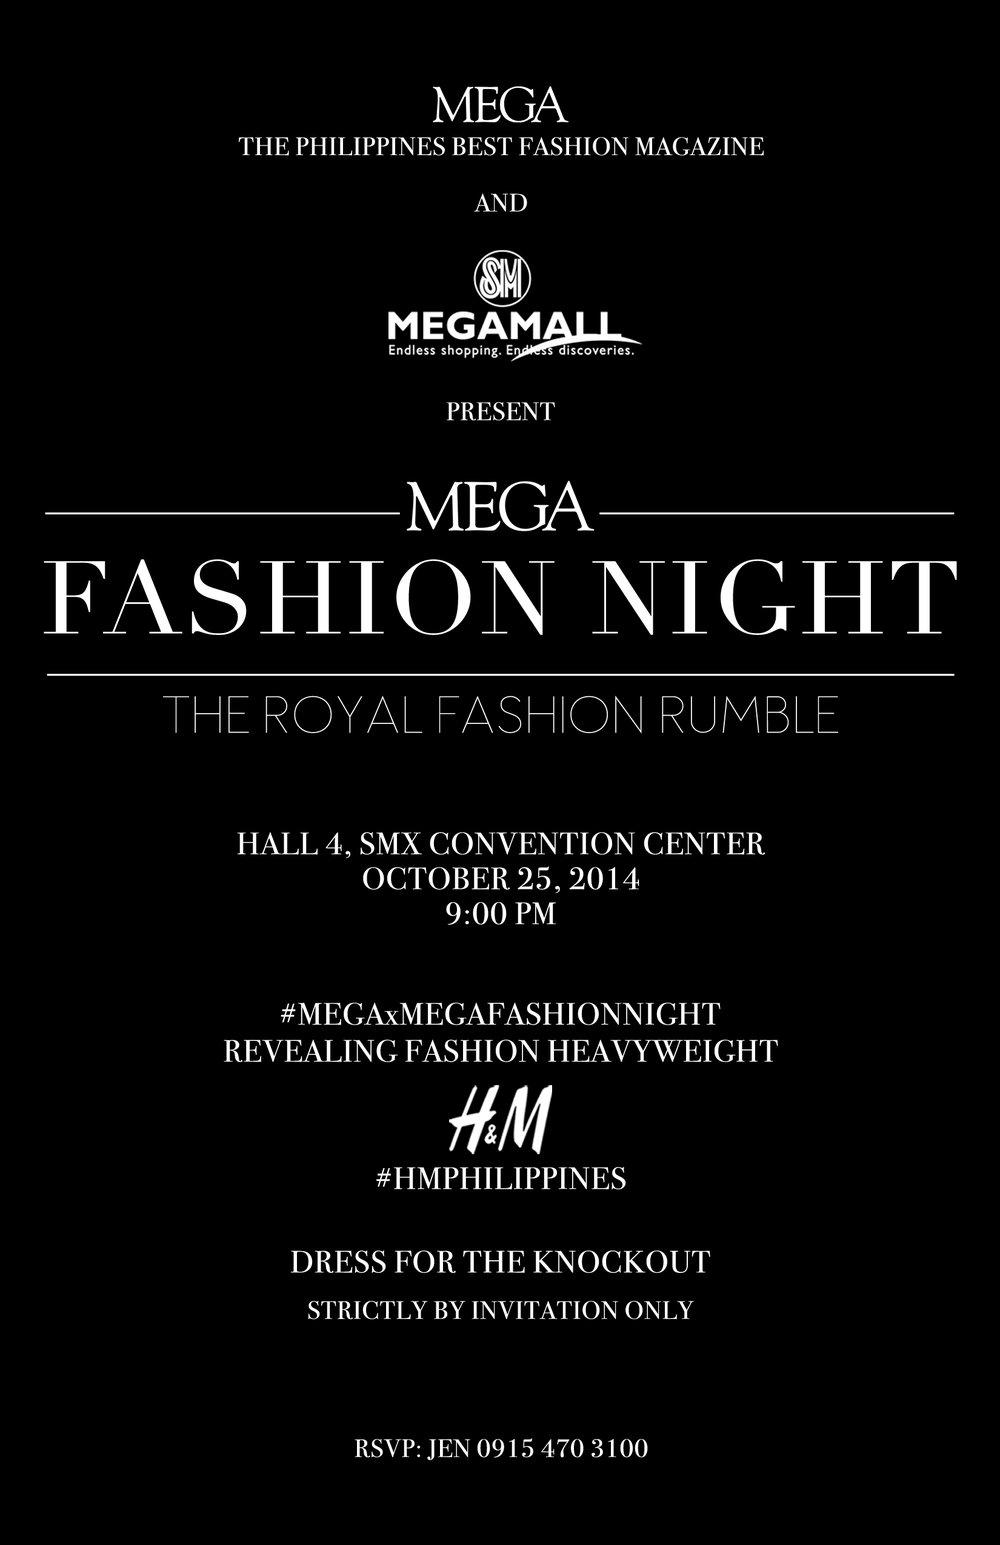 H&M Invite FINAL 2.jpg